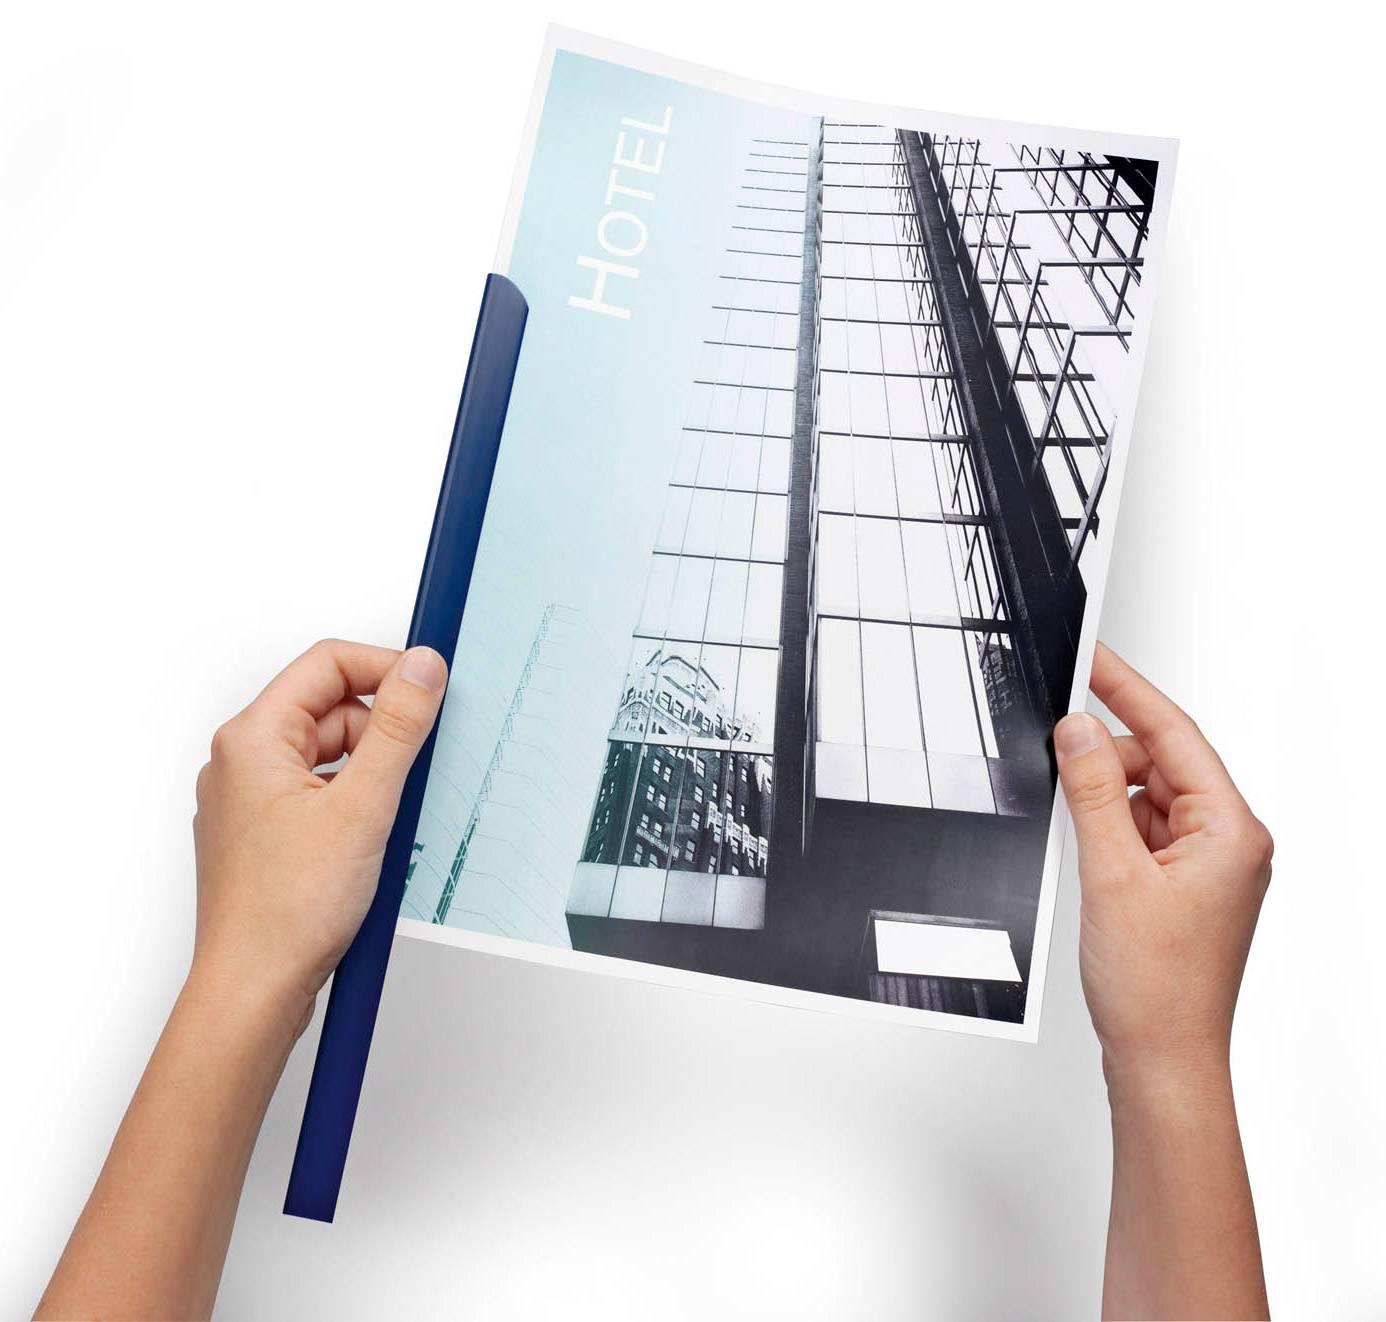 Скрепкошина Durable Spine Bars 2900-07 пластик 30листов 15х3мм темно-синий - фото 1